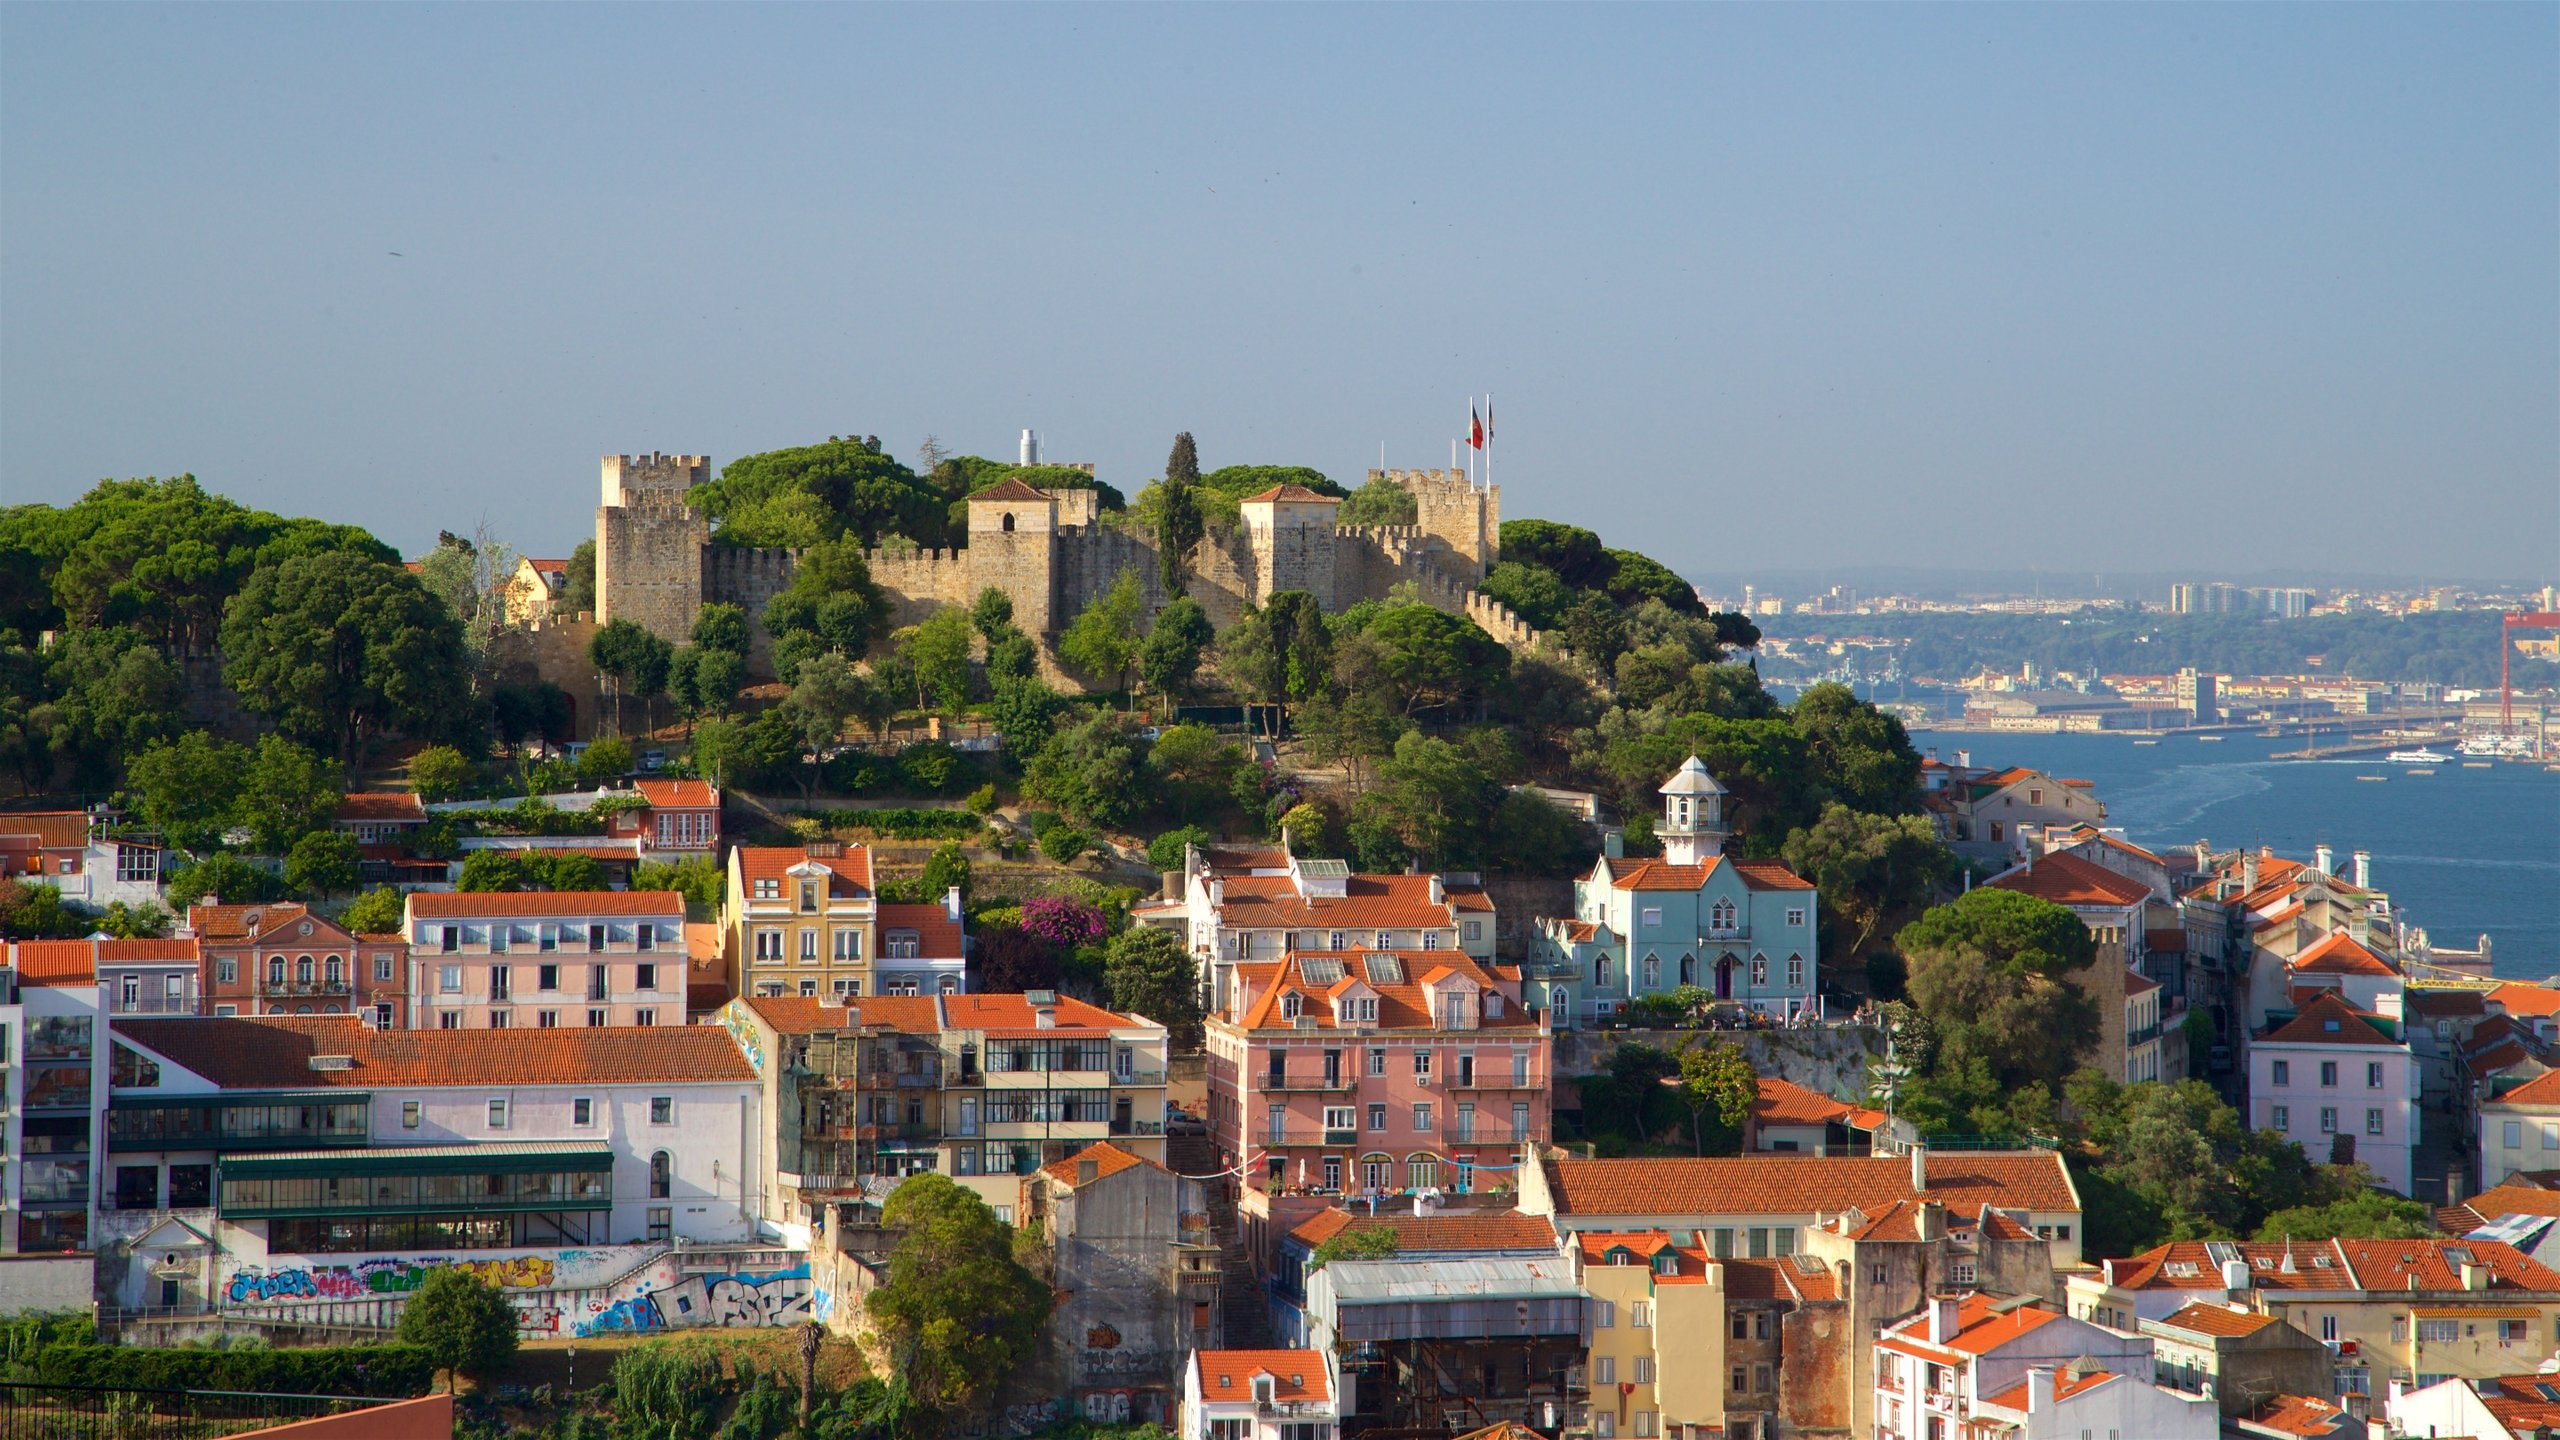 São Vicente, Lisbon, Lisbon District, Portugal